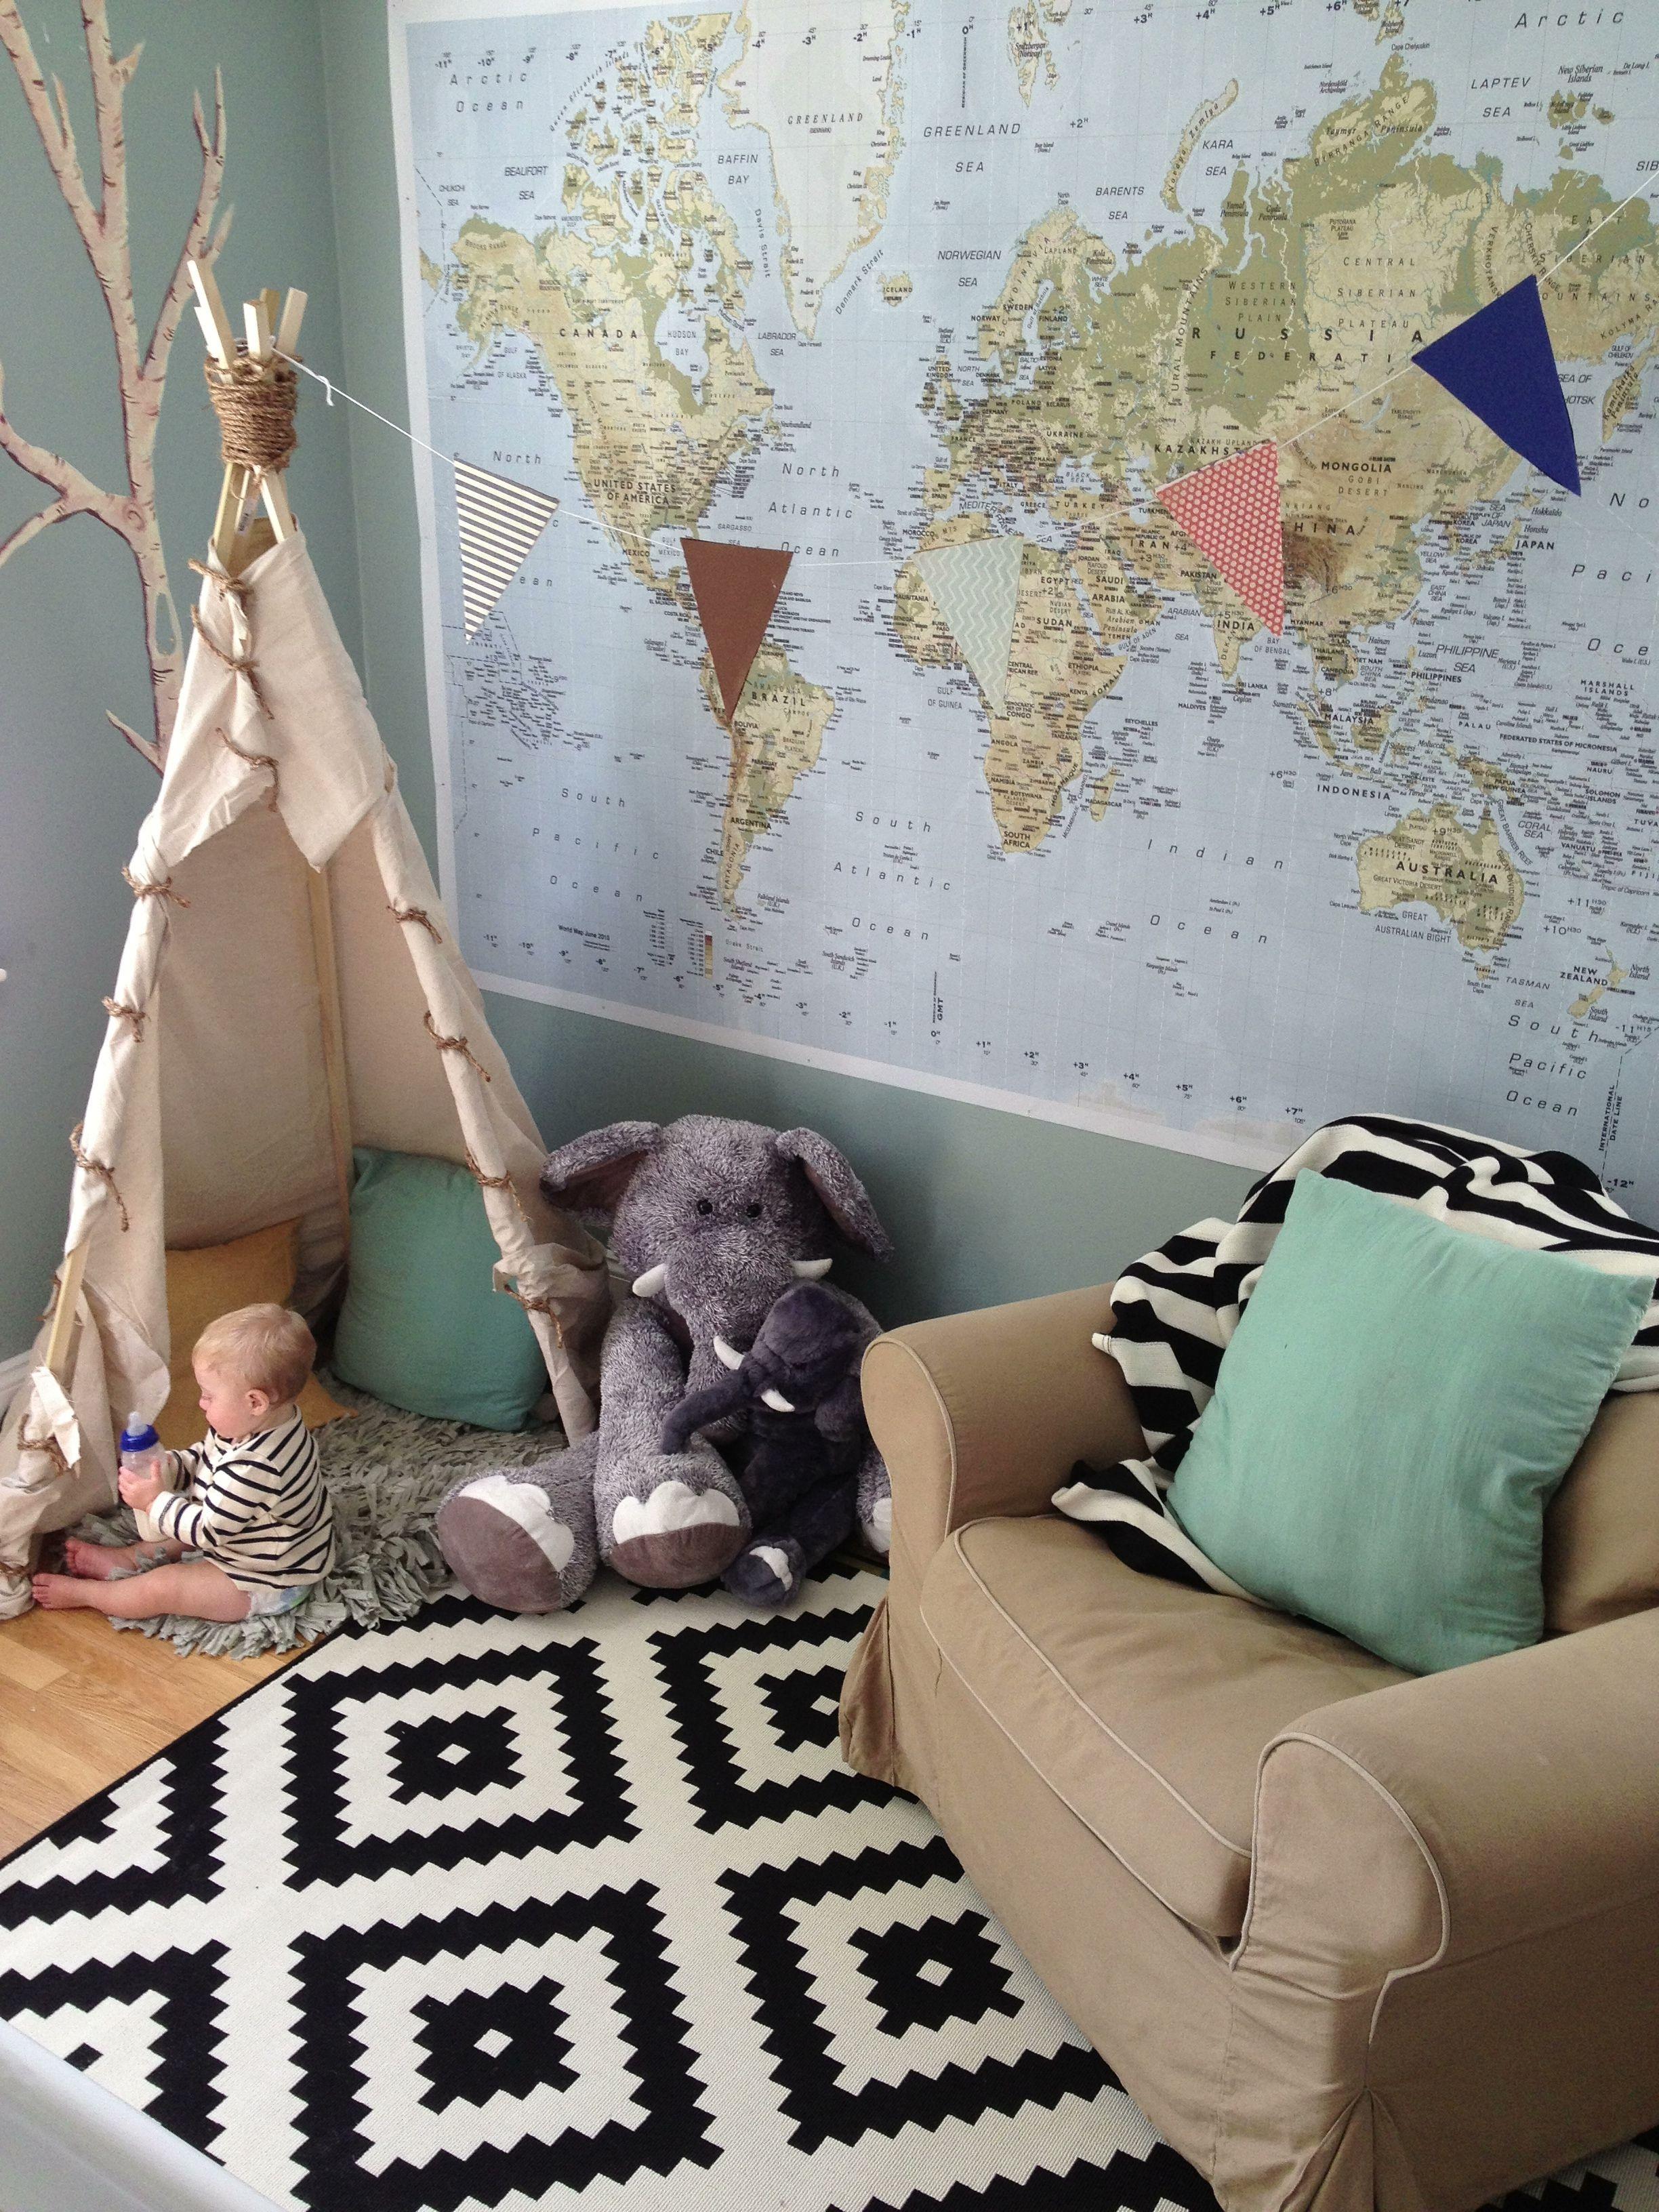 39 ides inspirations pour la dcoration de la chambre bb kids teepee world map baby room ikea rug instagram kristindarling gumiabroncs Images